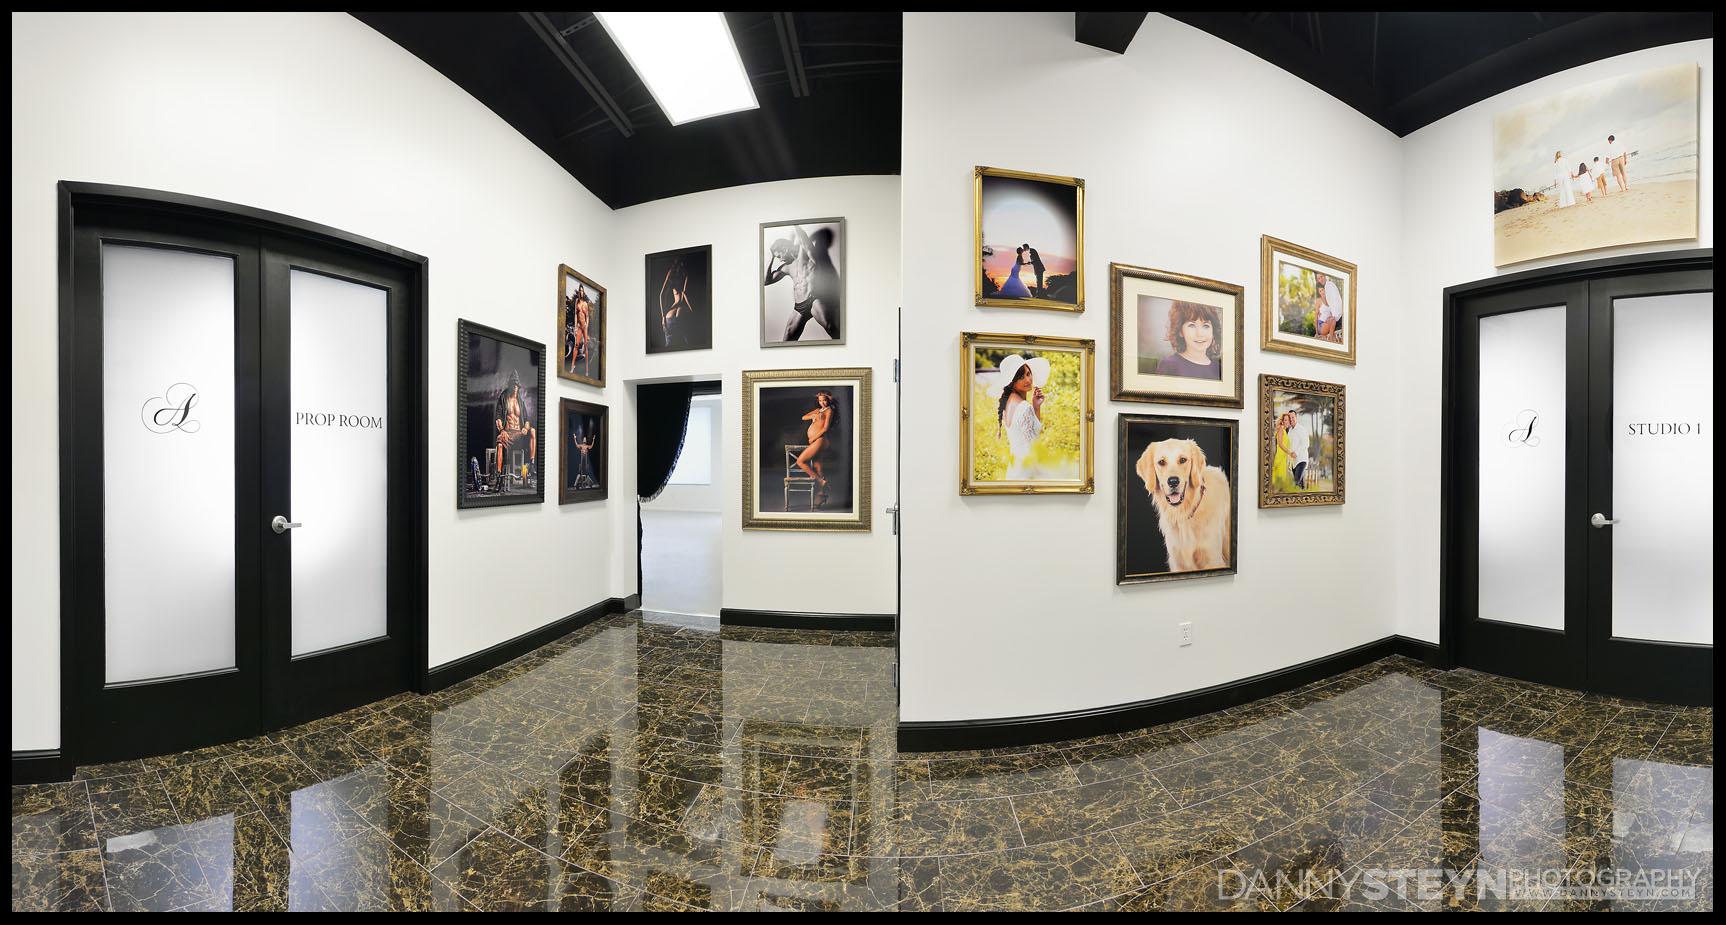 Danny Steyn Photography Studios - Gallery